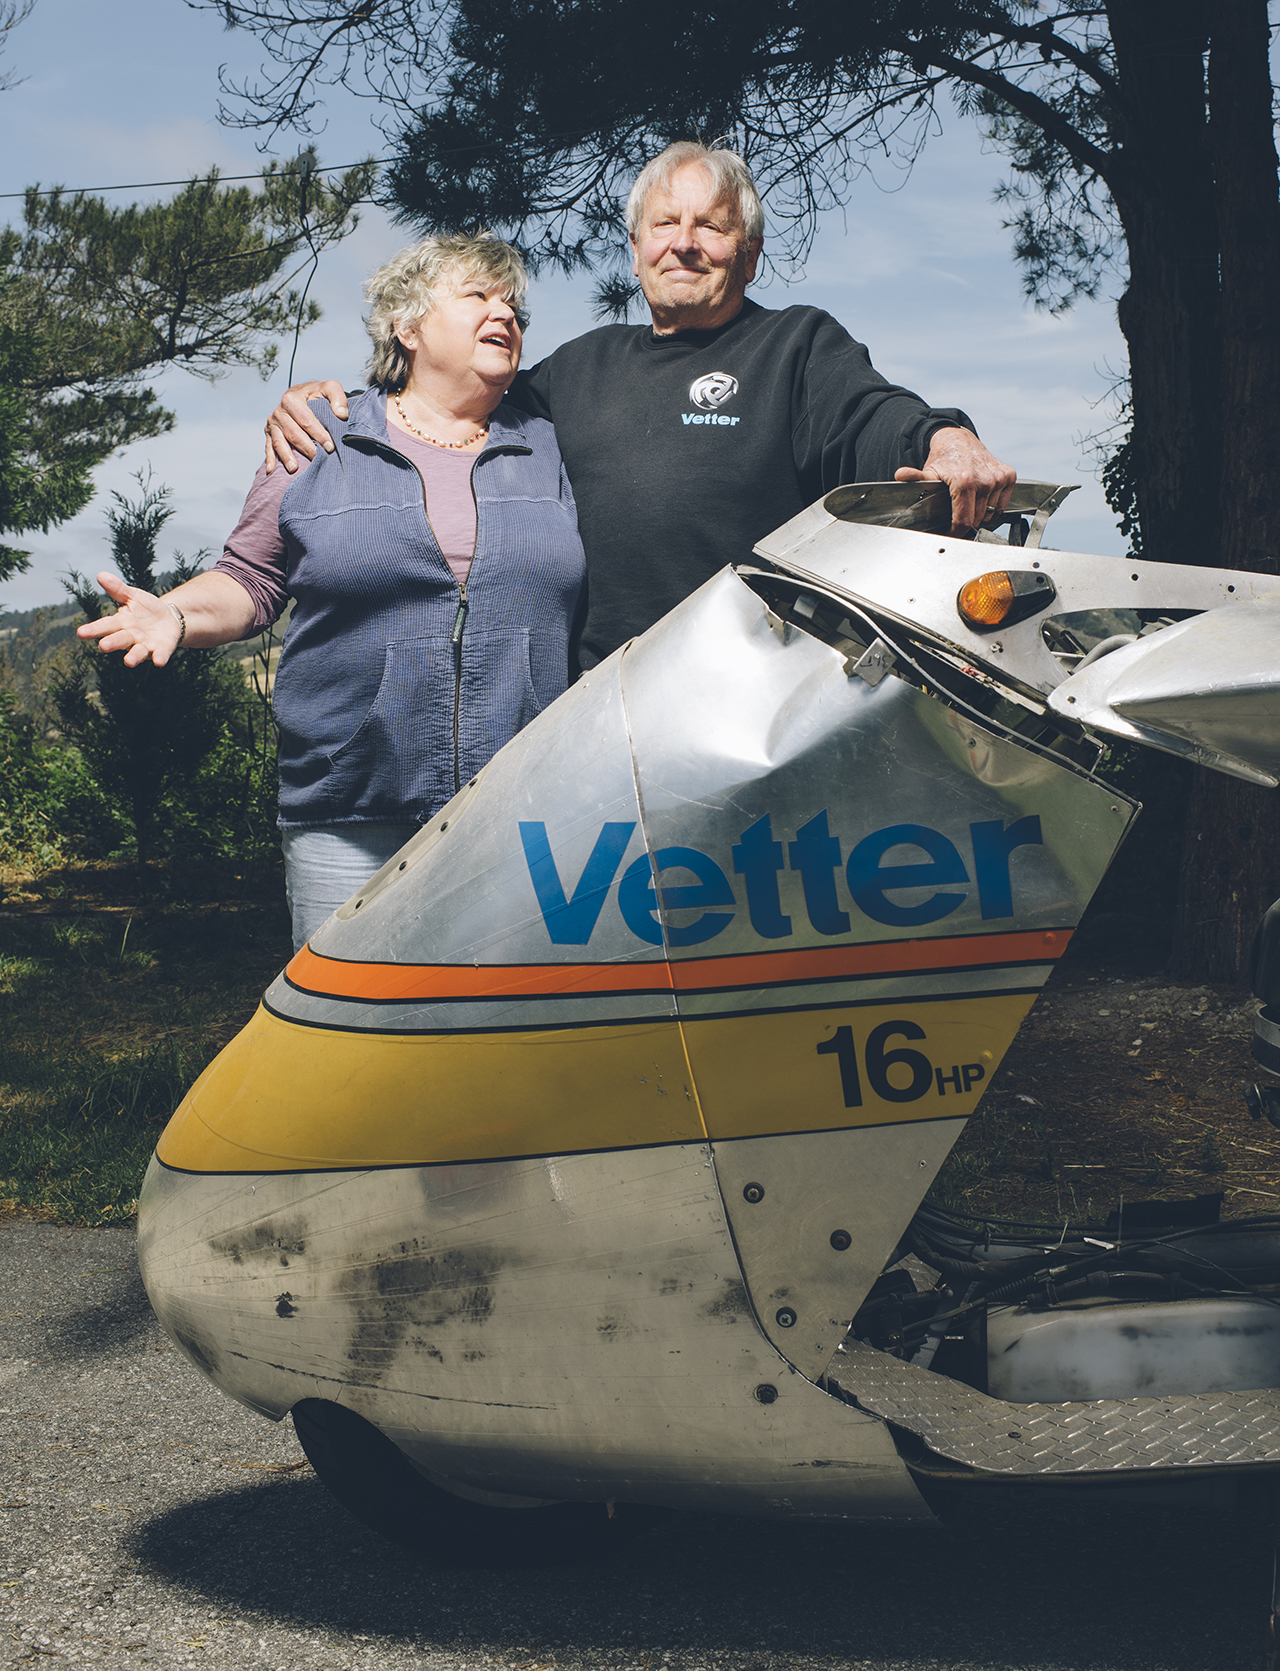 Craig and Carol Vetter. Carol had a long career at Vetter Fairings and is an avid motorcyclist herself.